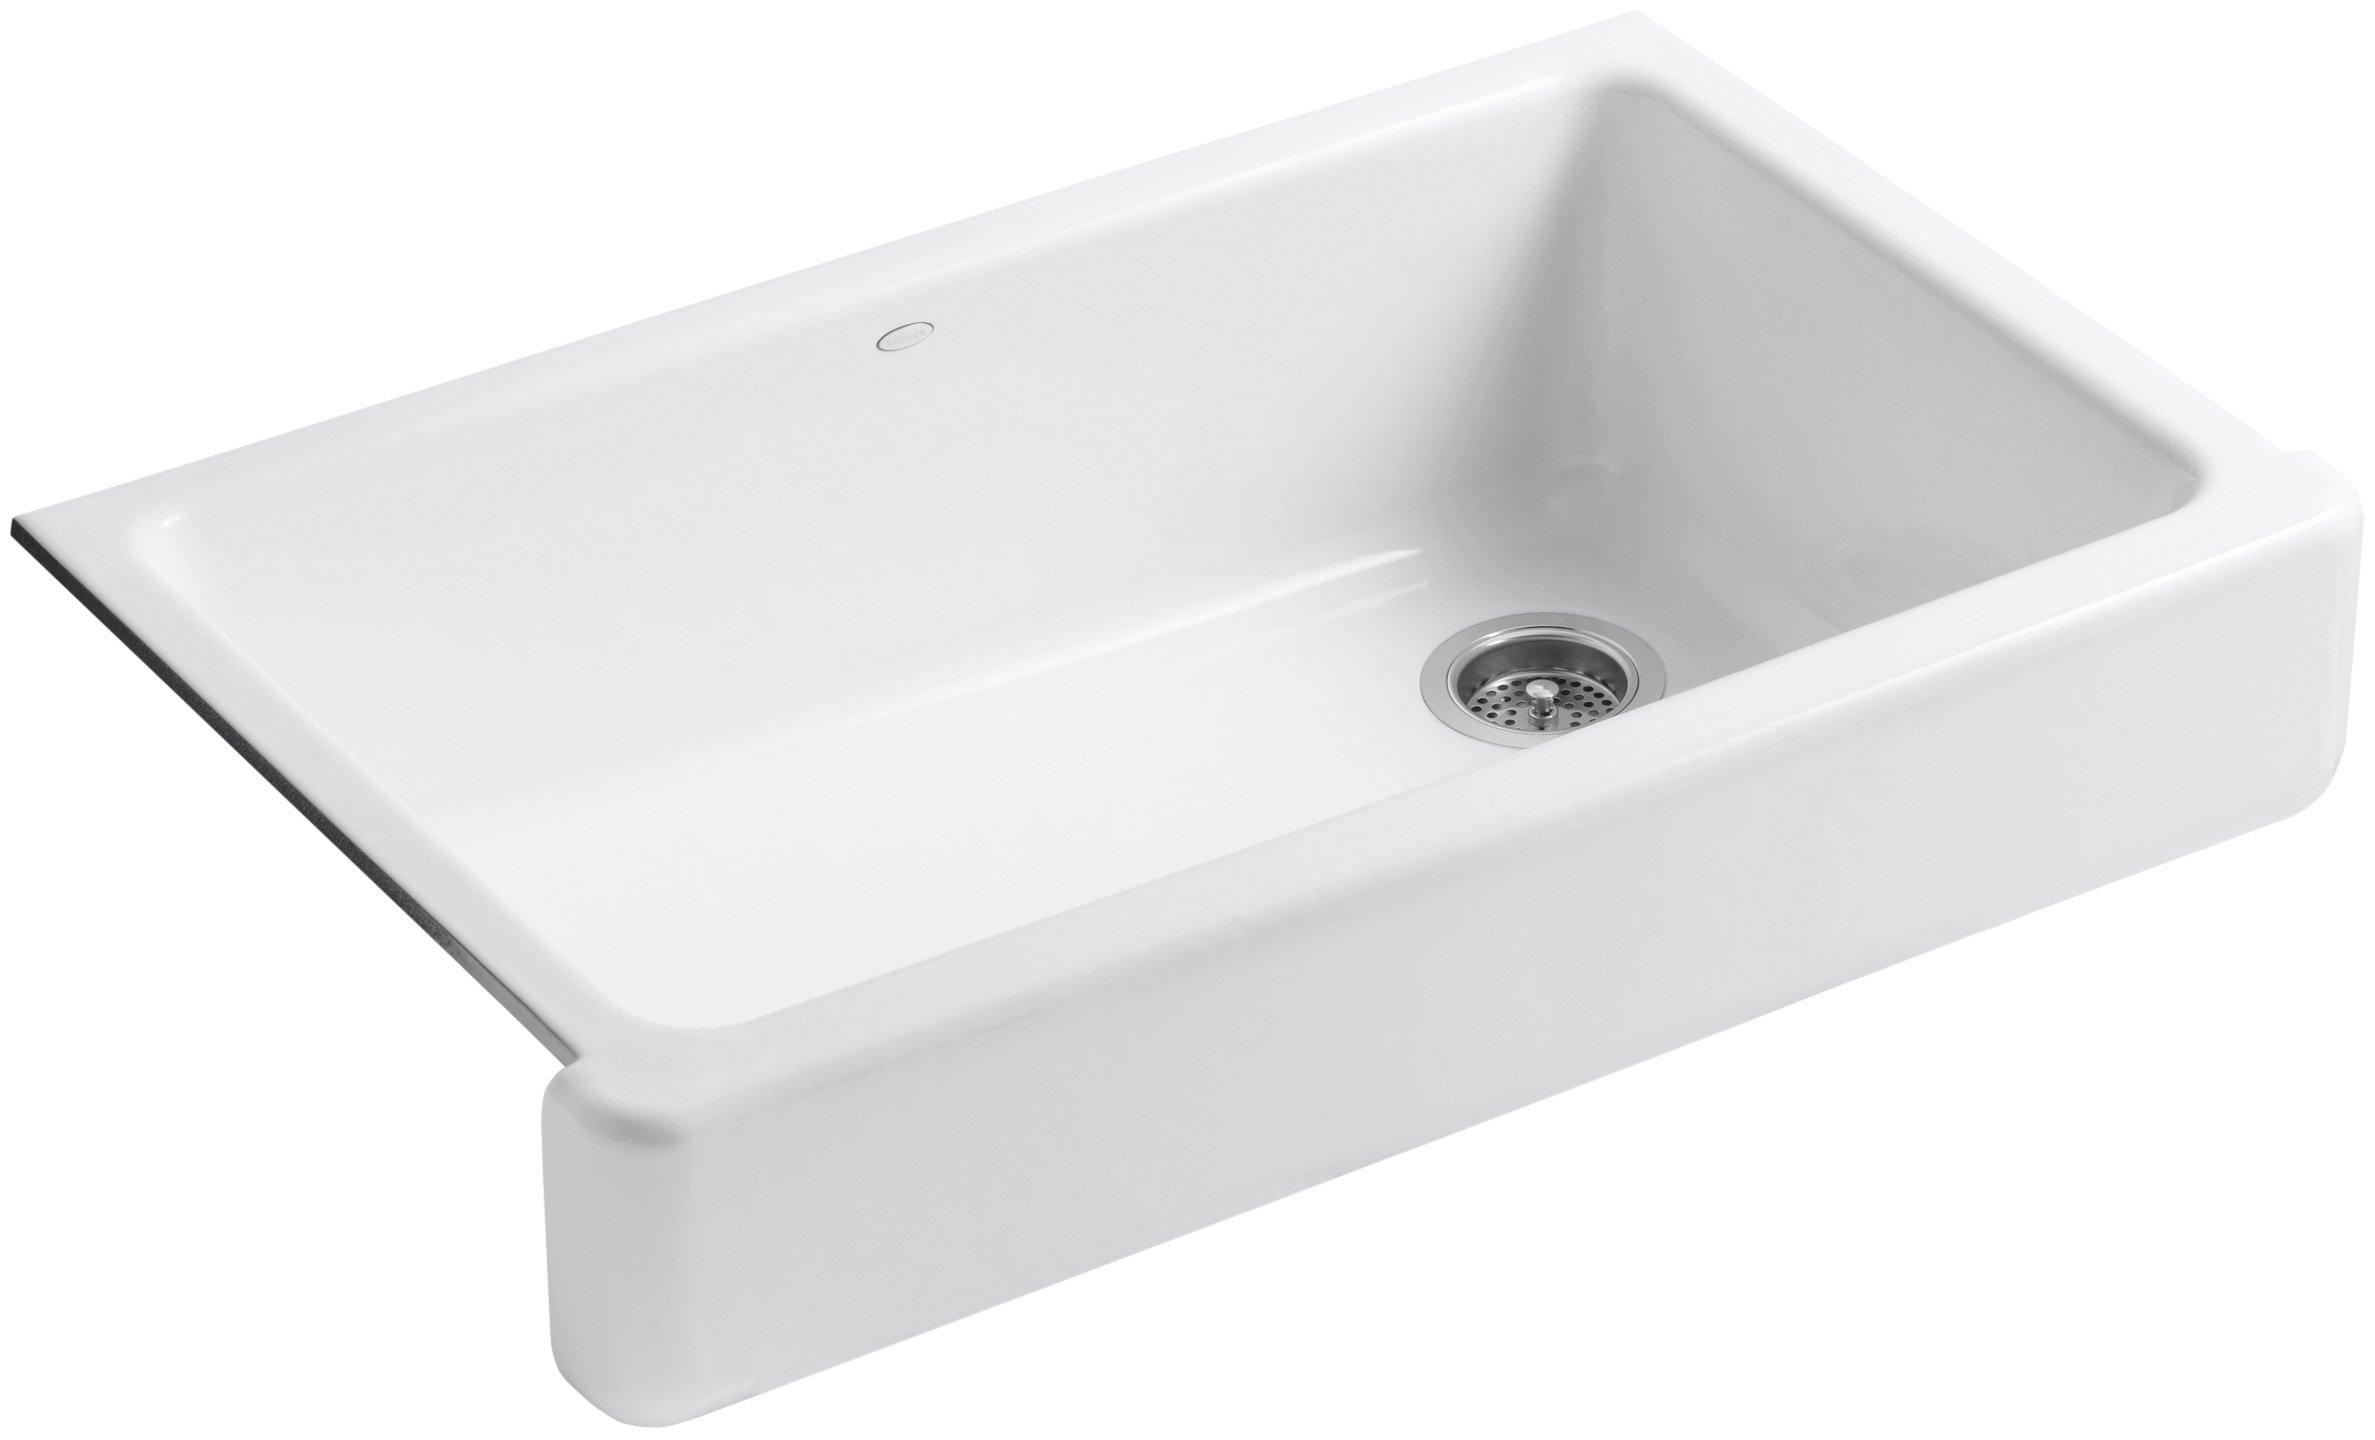 KOHLER K-6488-0 Whitehaven Self-Trimming Apron Front Single Basin Sink with Short Apron, White